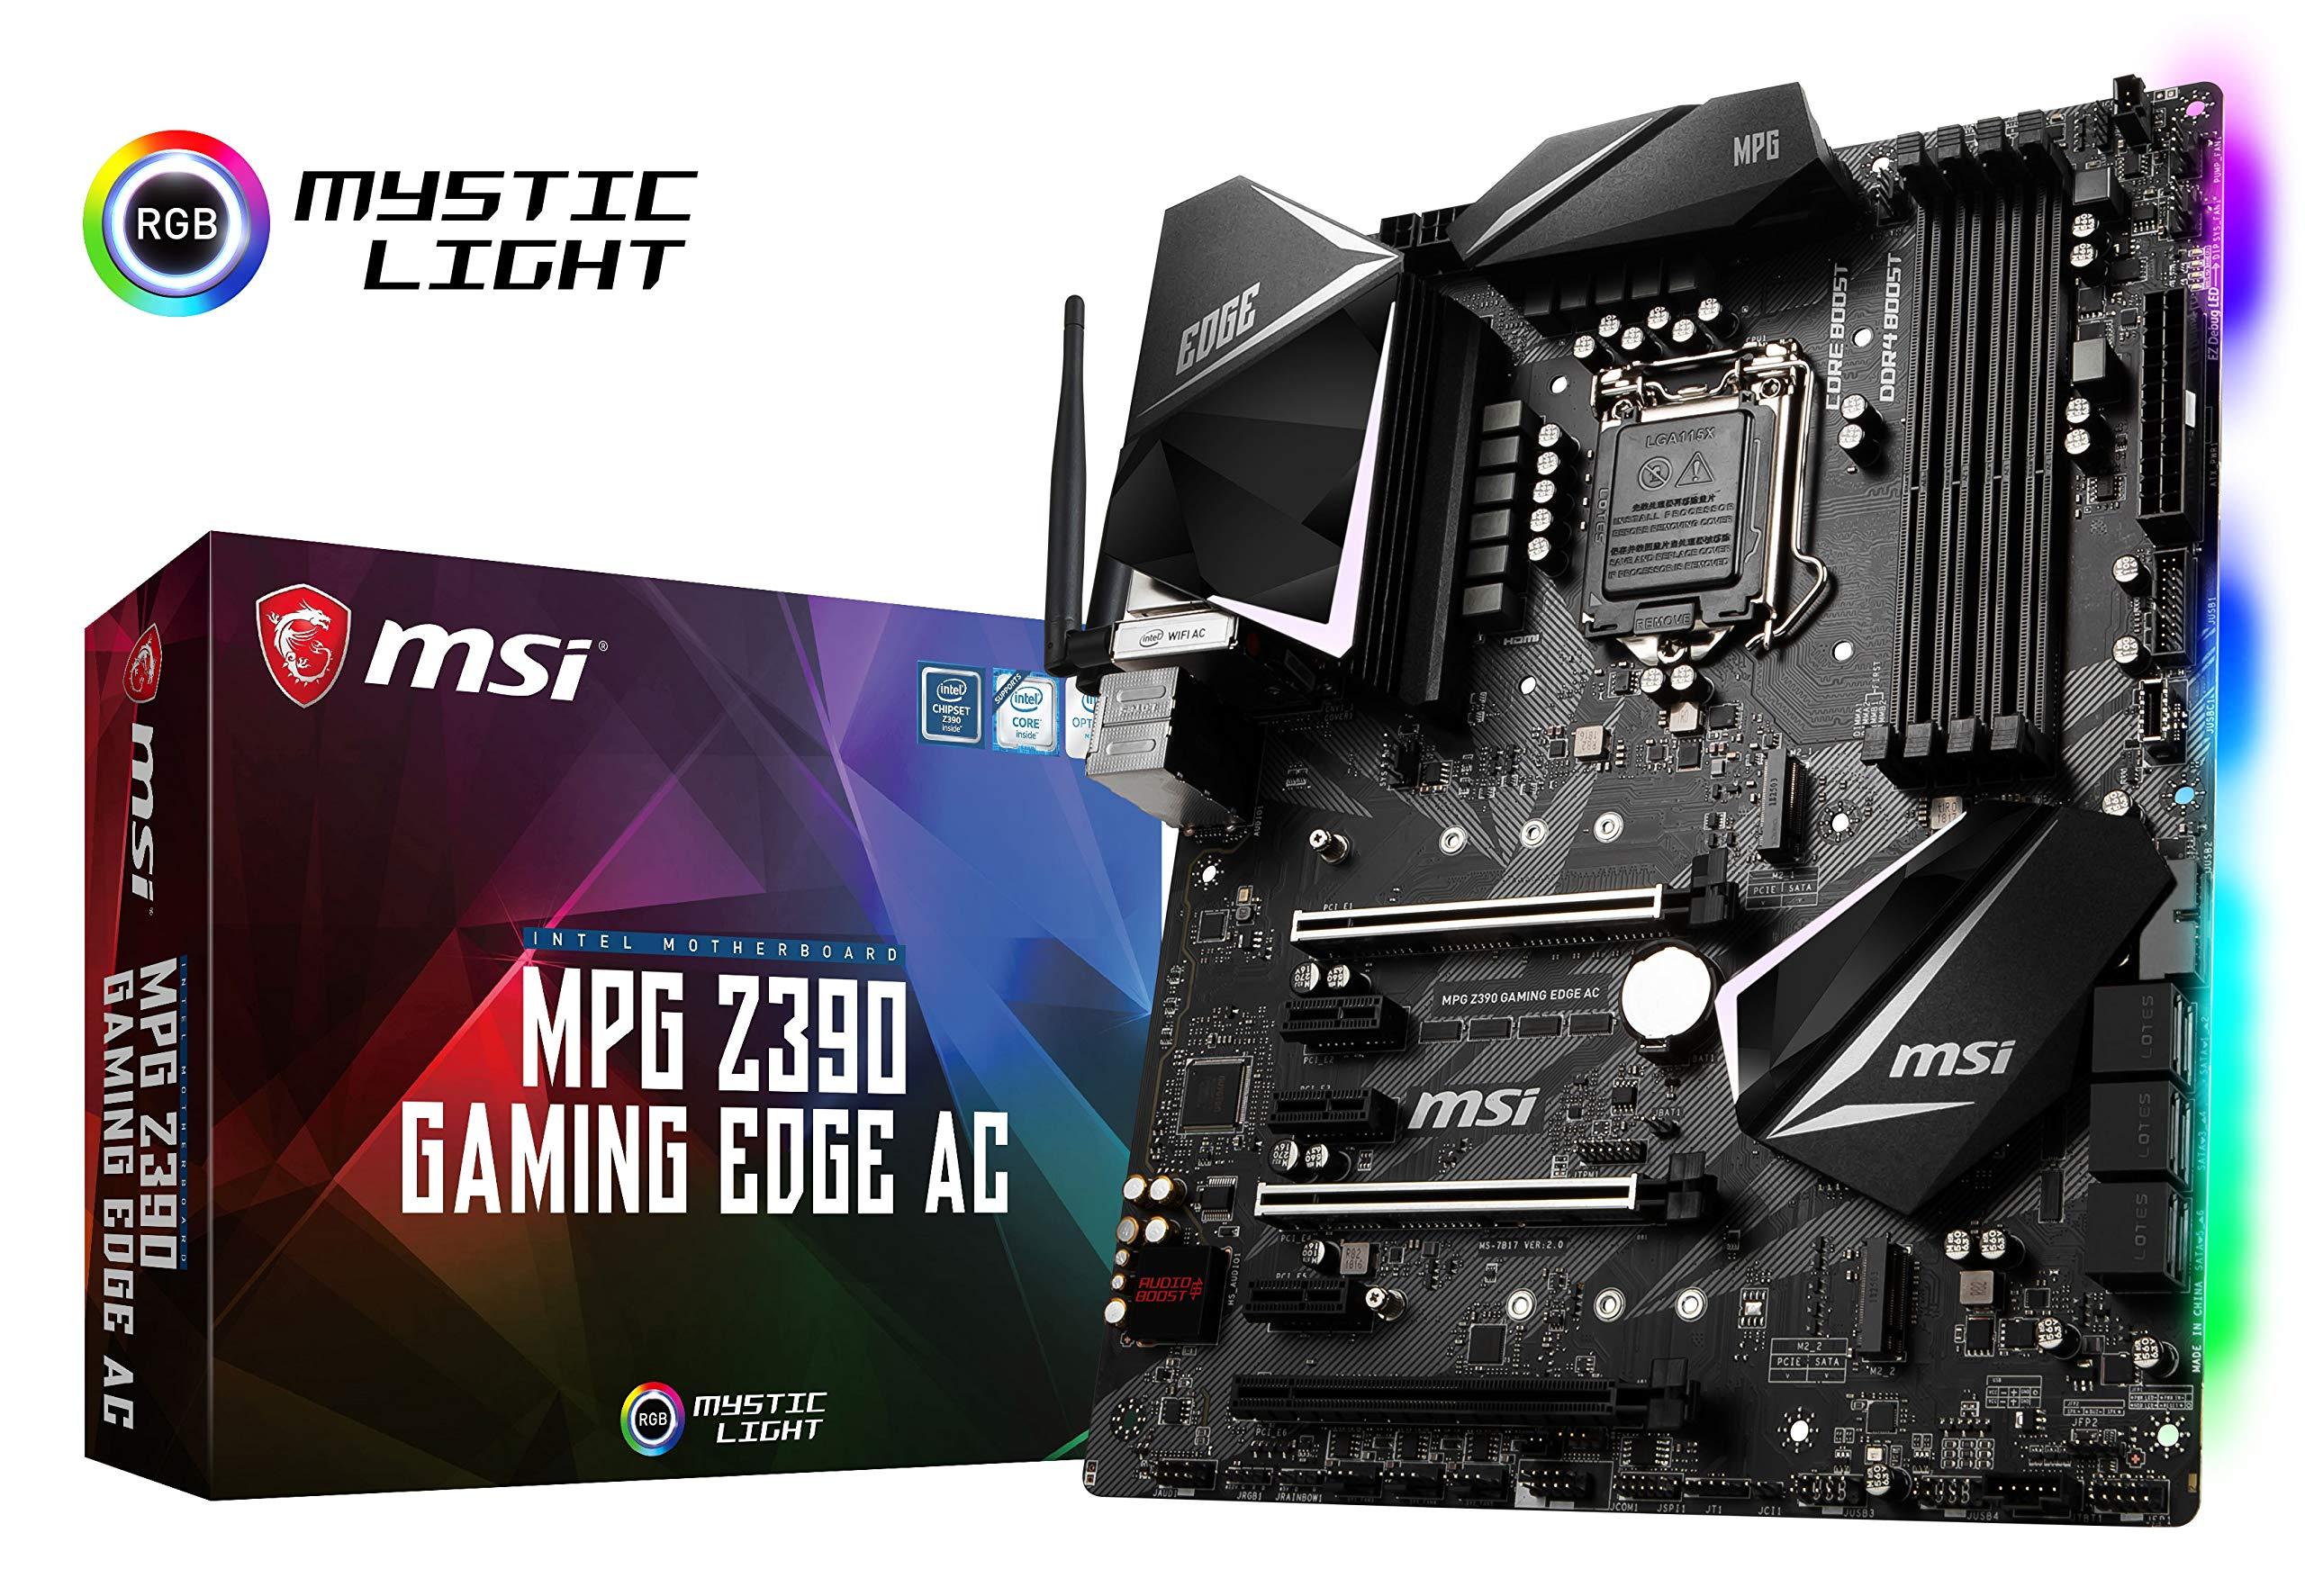 MSI MPG Z390 Gaming Edge AC LGA1151 (Intel 8th and 9th Gen) M.2 USB 3.1 Gen 2 DDR4 HDMI DP Wi-Fi SLI CFX ATX Z390 Gaming Motherboard by MSI